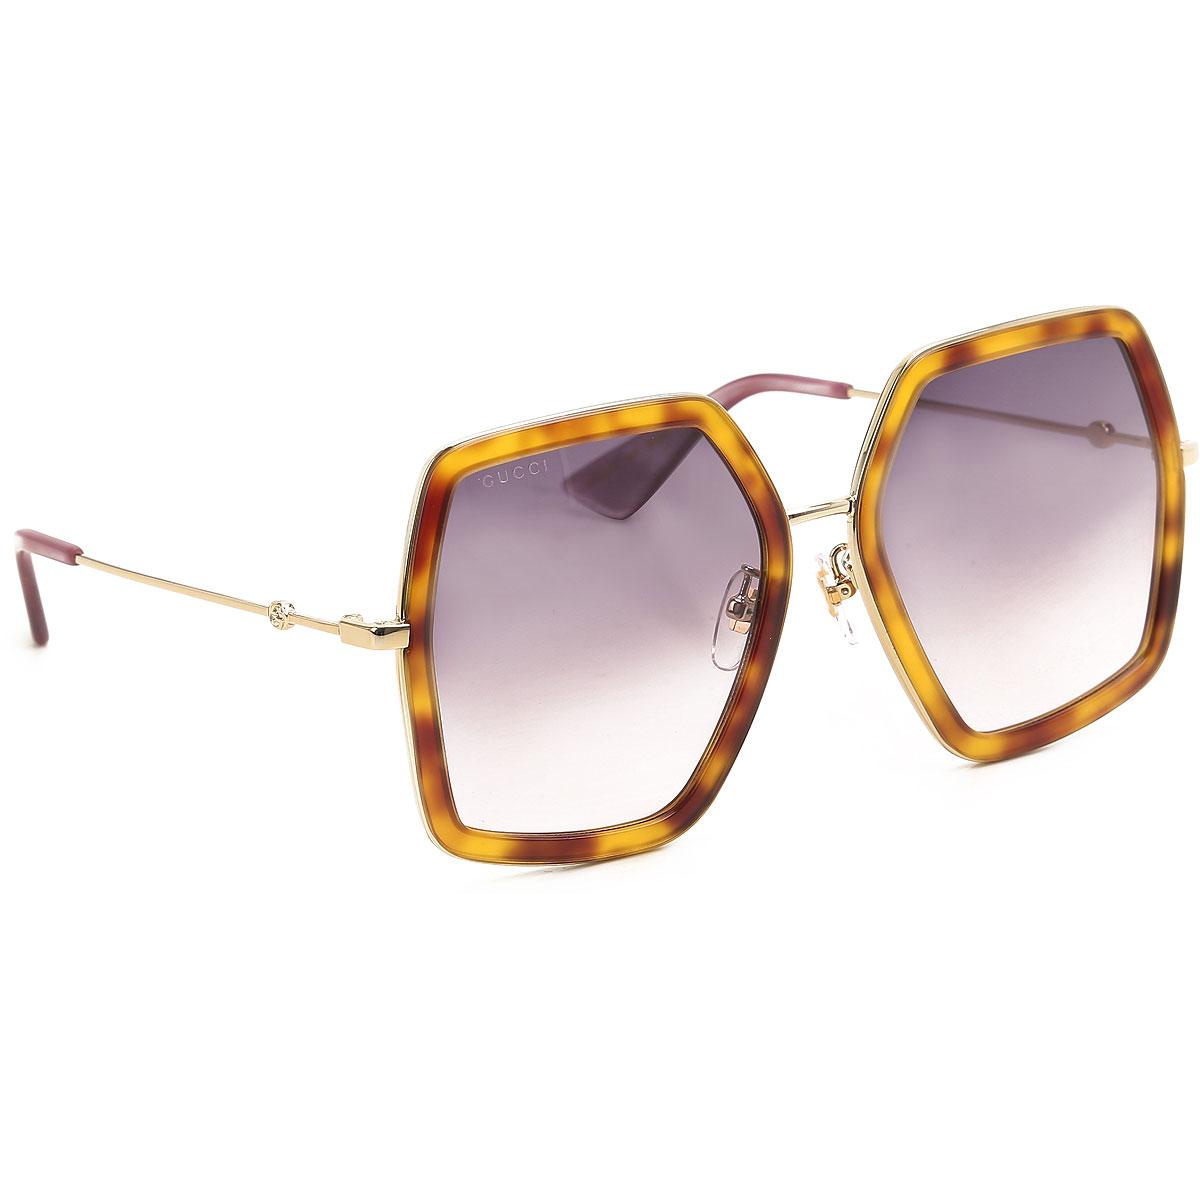 Gafas y Lentes de Sol Gucci, Detalle Modelo: gg0106s-003-